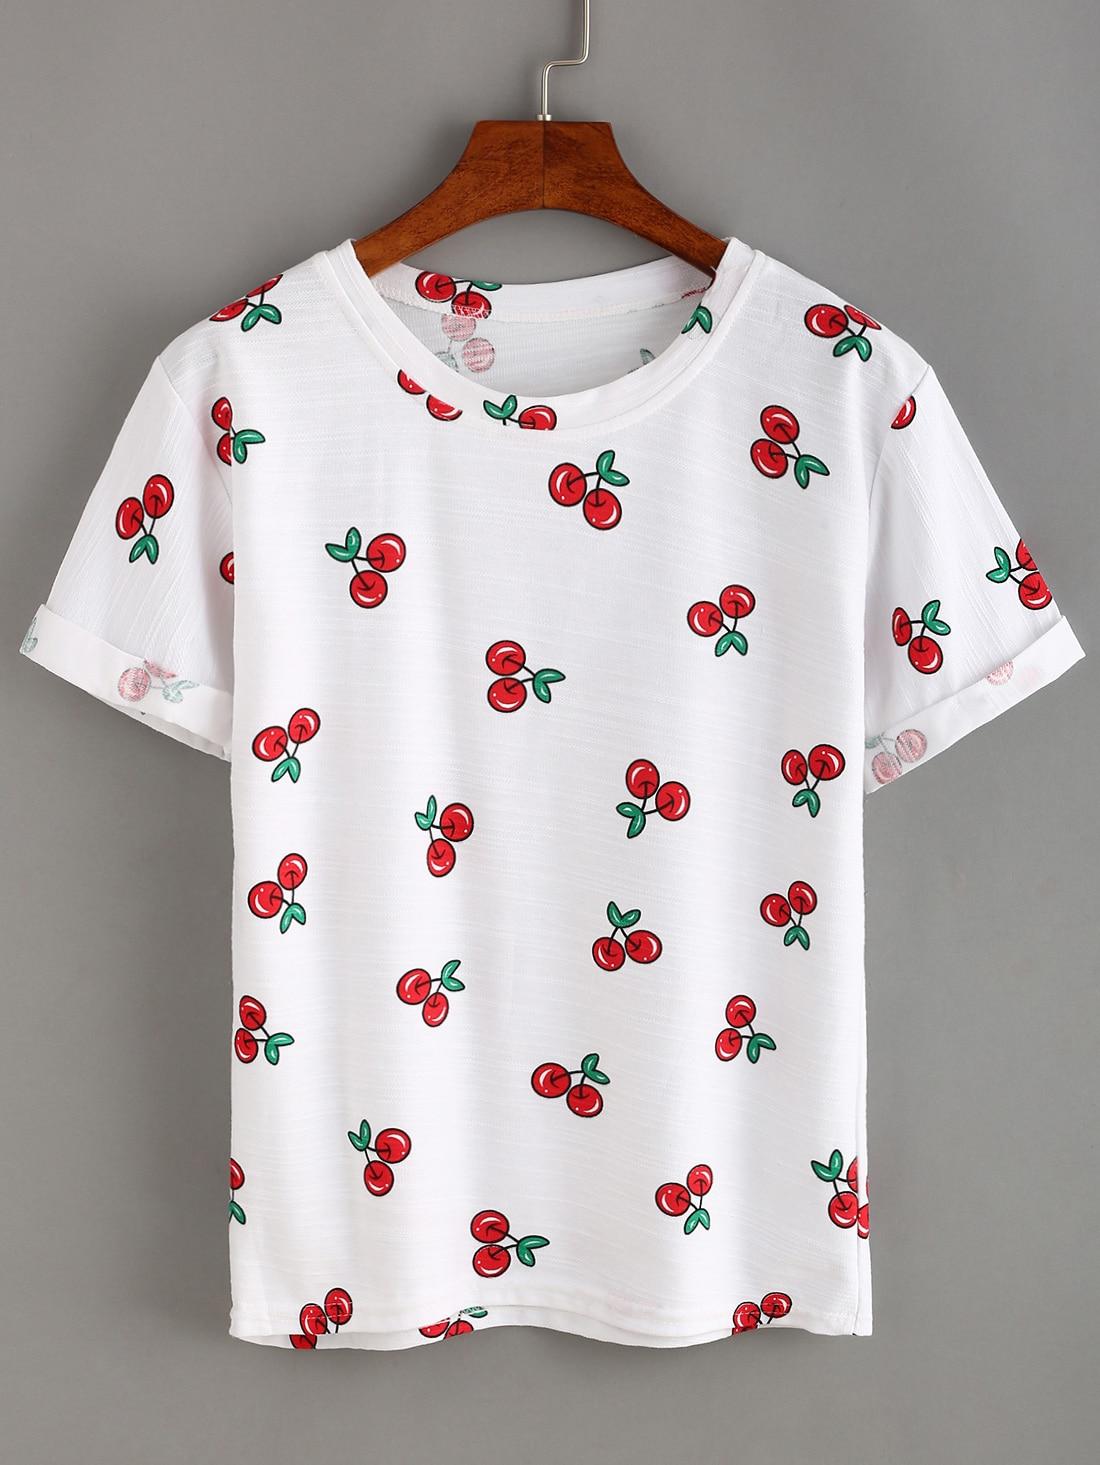 Allover Cherry Print T Shirt Shein Sheinside